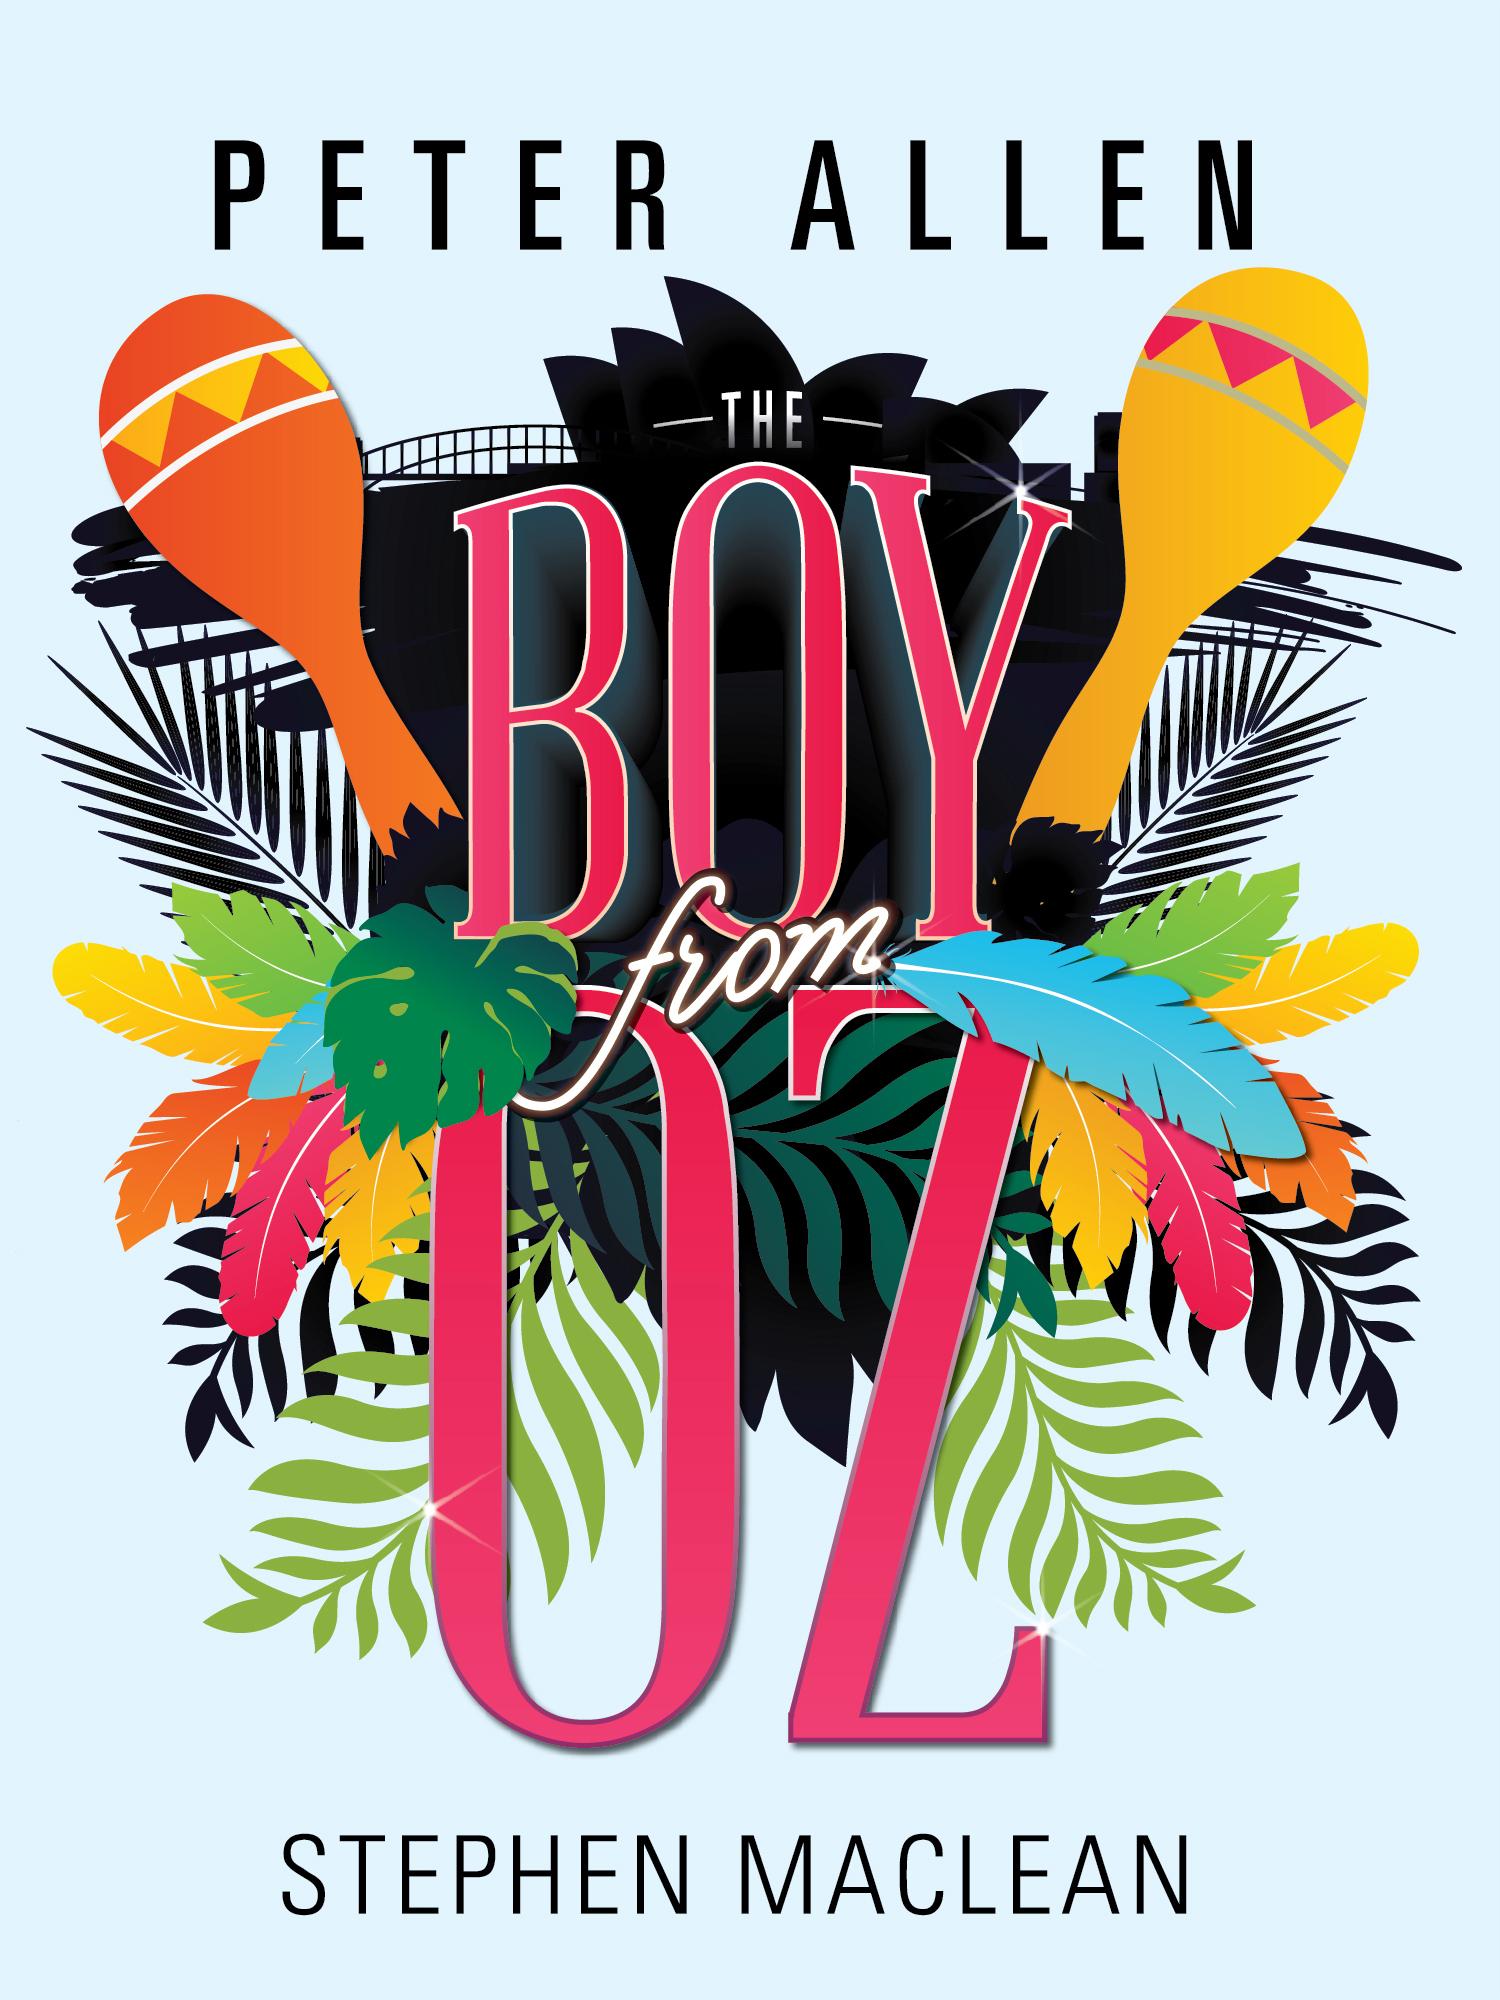 Peter Allen: The Boy From Oz Stephen MacLean